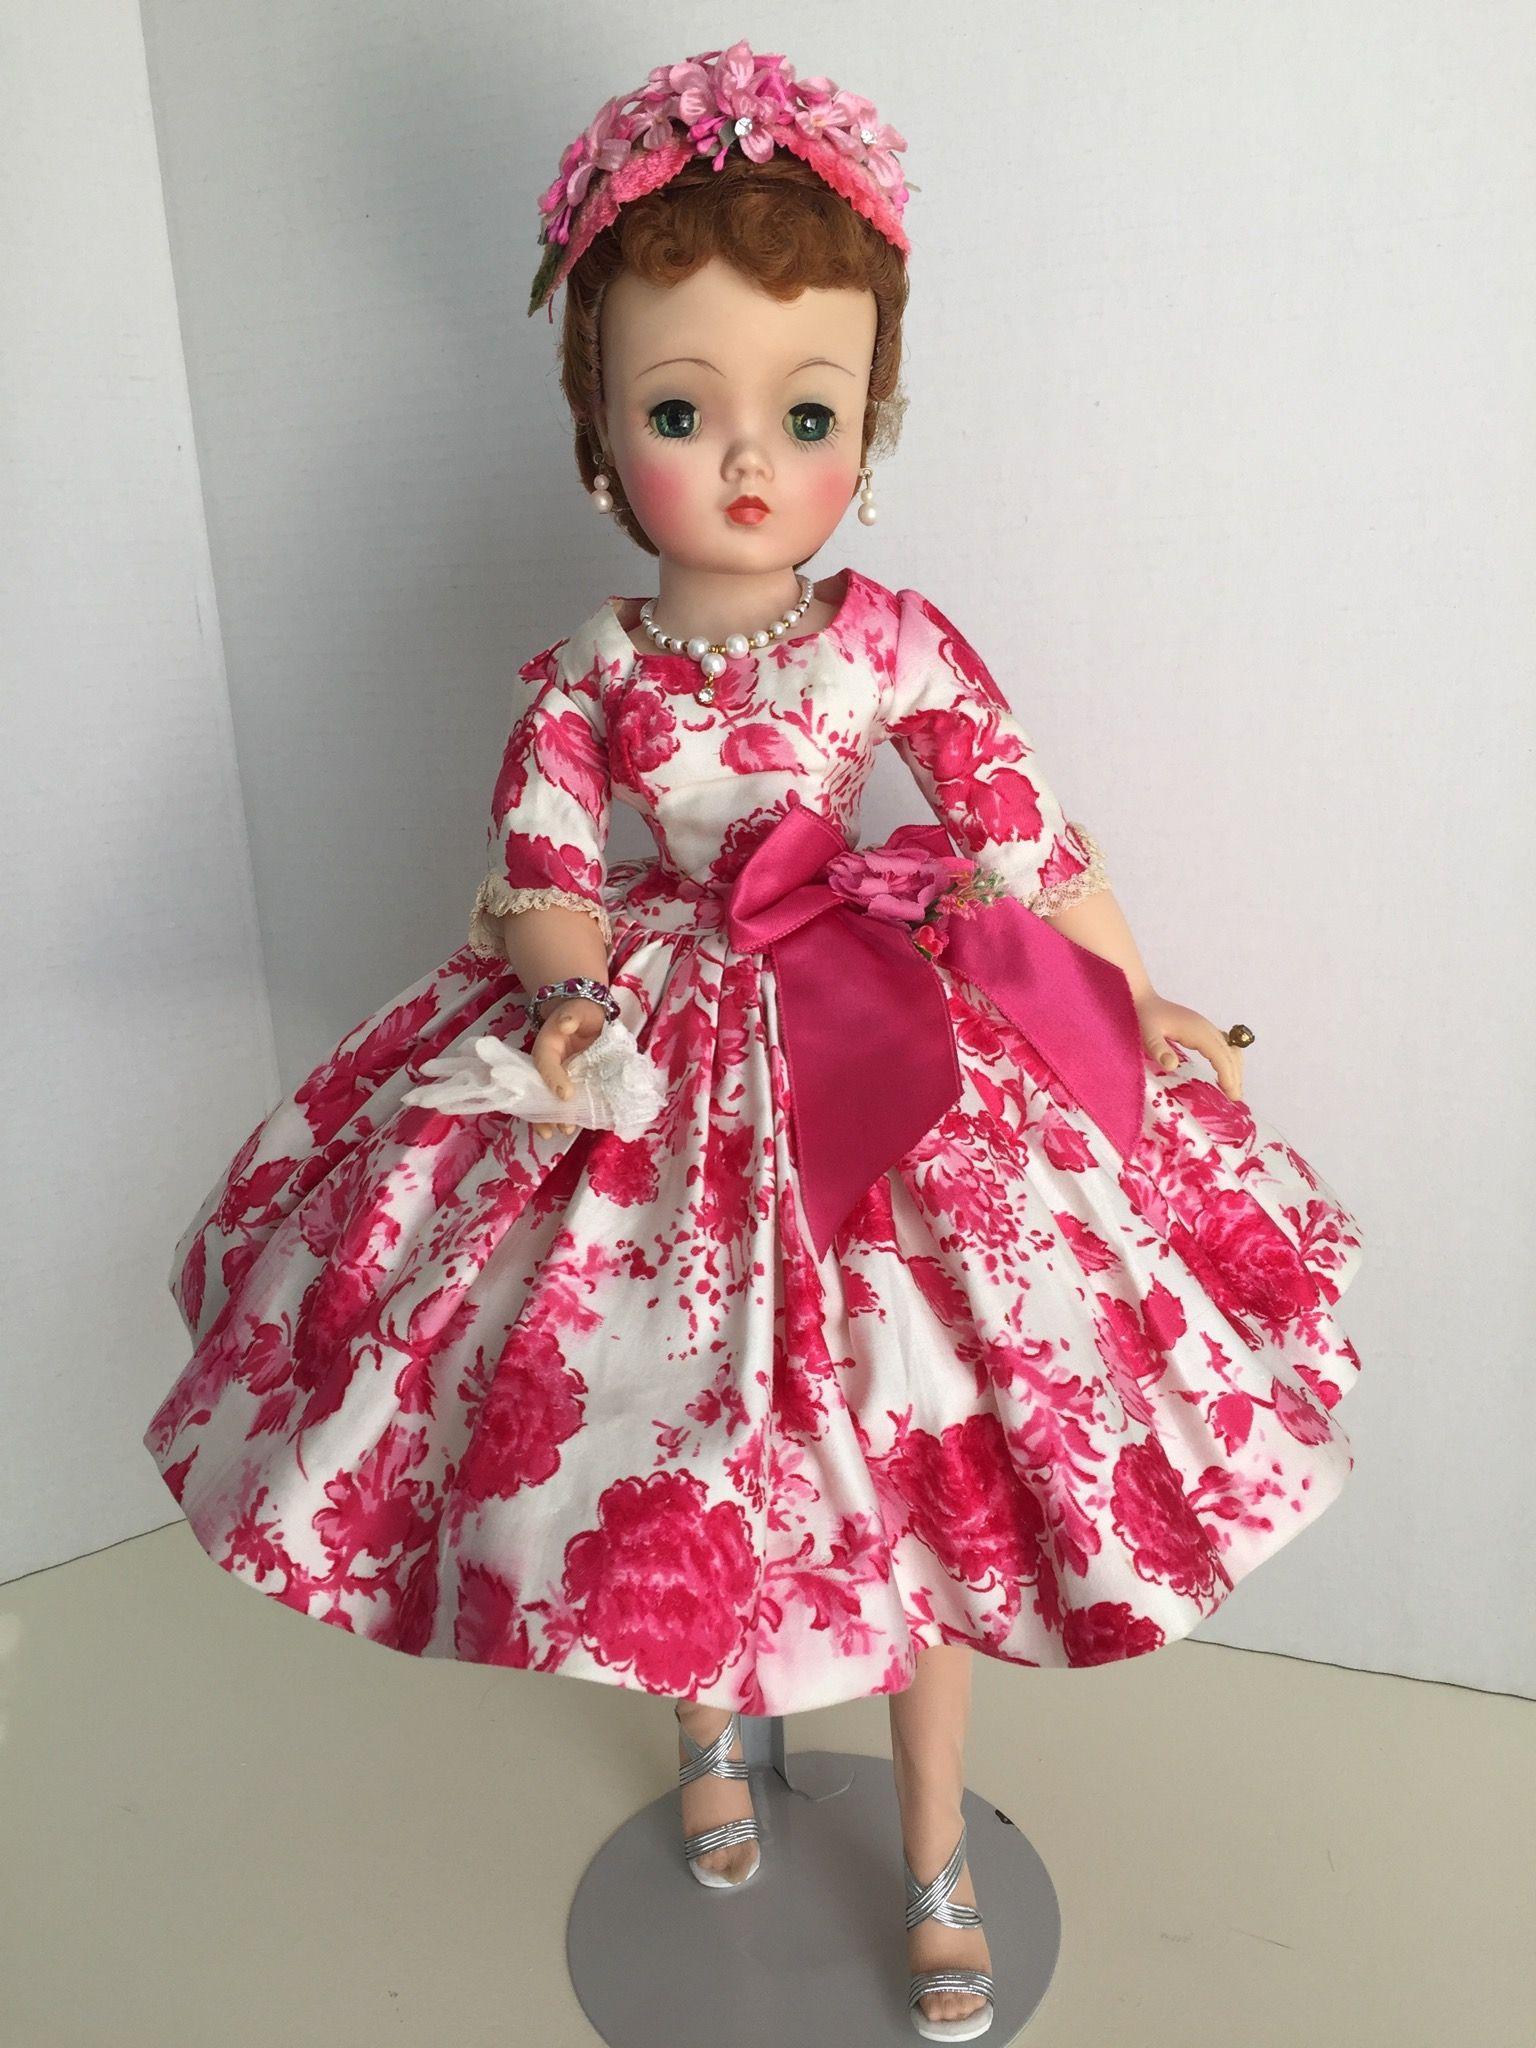 1958 camellia print dress | Other DOLLS | Pinterest | Muñecas y ...